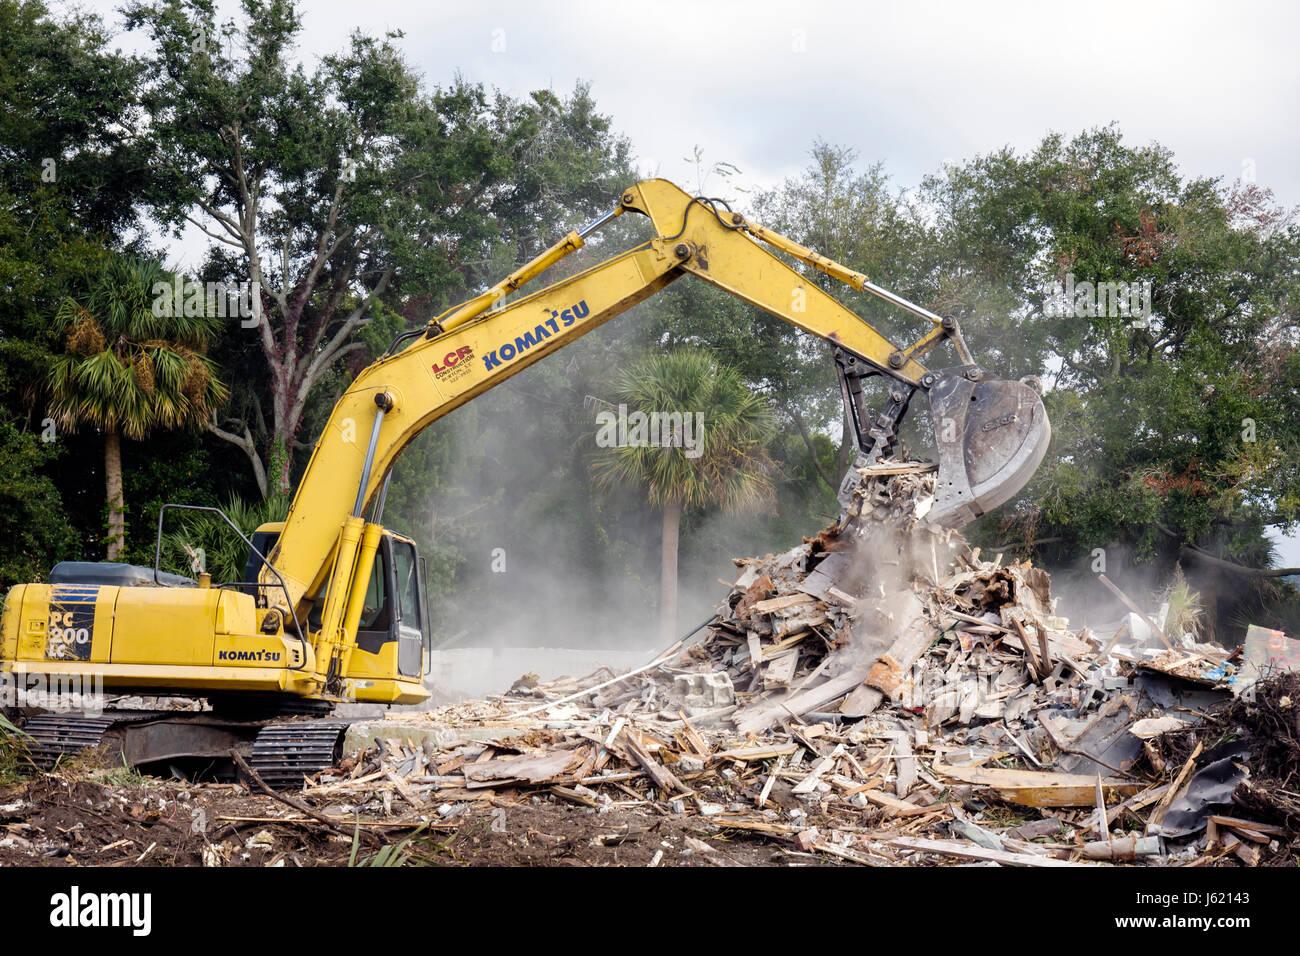 South Carolina Beaufort Bay Street building demolition demolish tear down raze razing site structure wood wooden - Stock Image